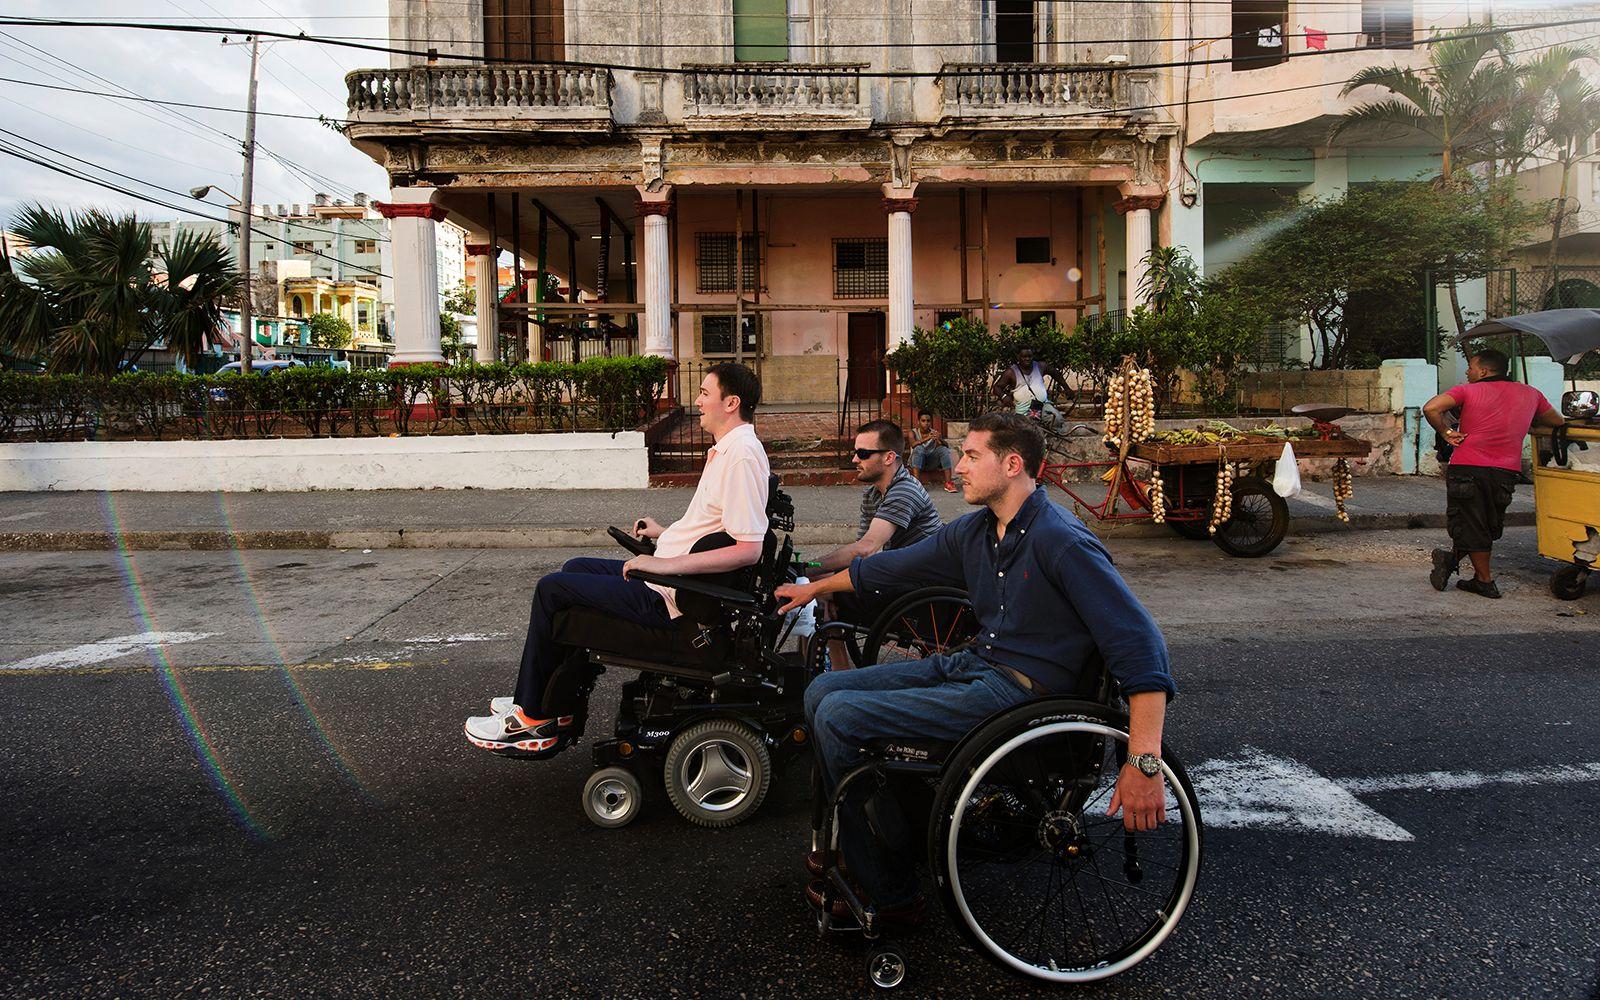 Navigating Cuba & Quadriplegic athlete navigates Cuba to show others how to live ...